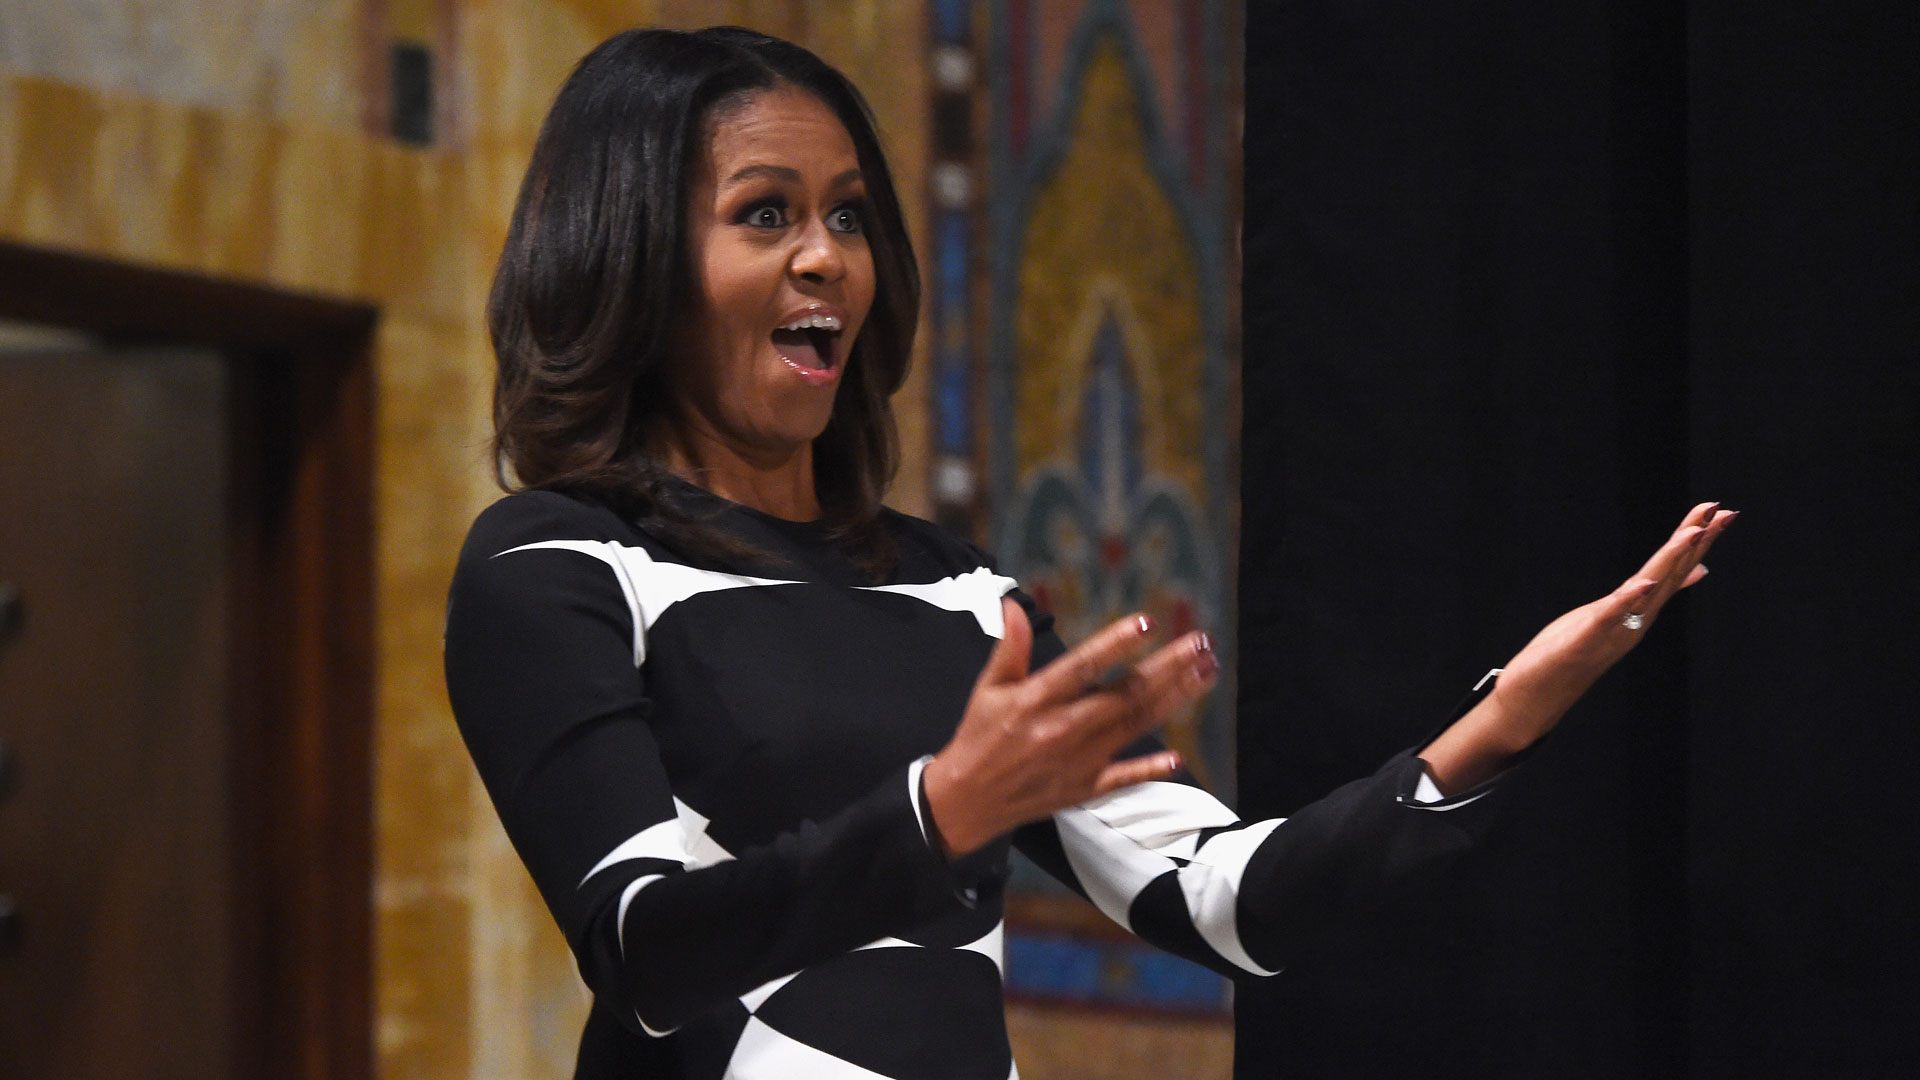 En Obama Michelle Bikini Lució Radiante BlancoTelemundo Un TPXOkZui